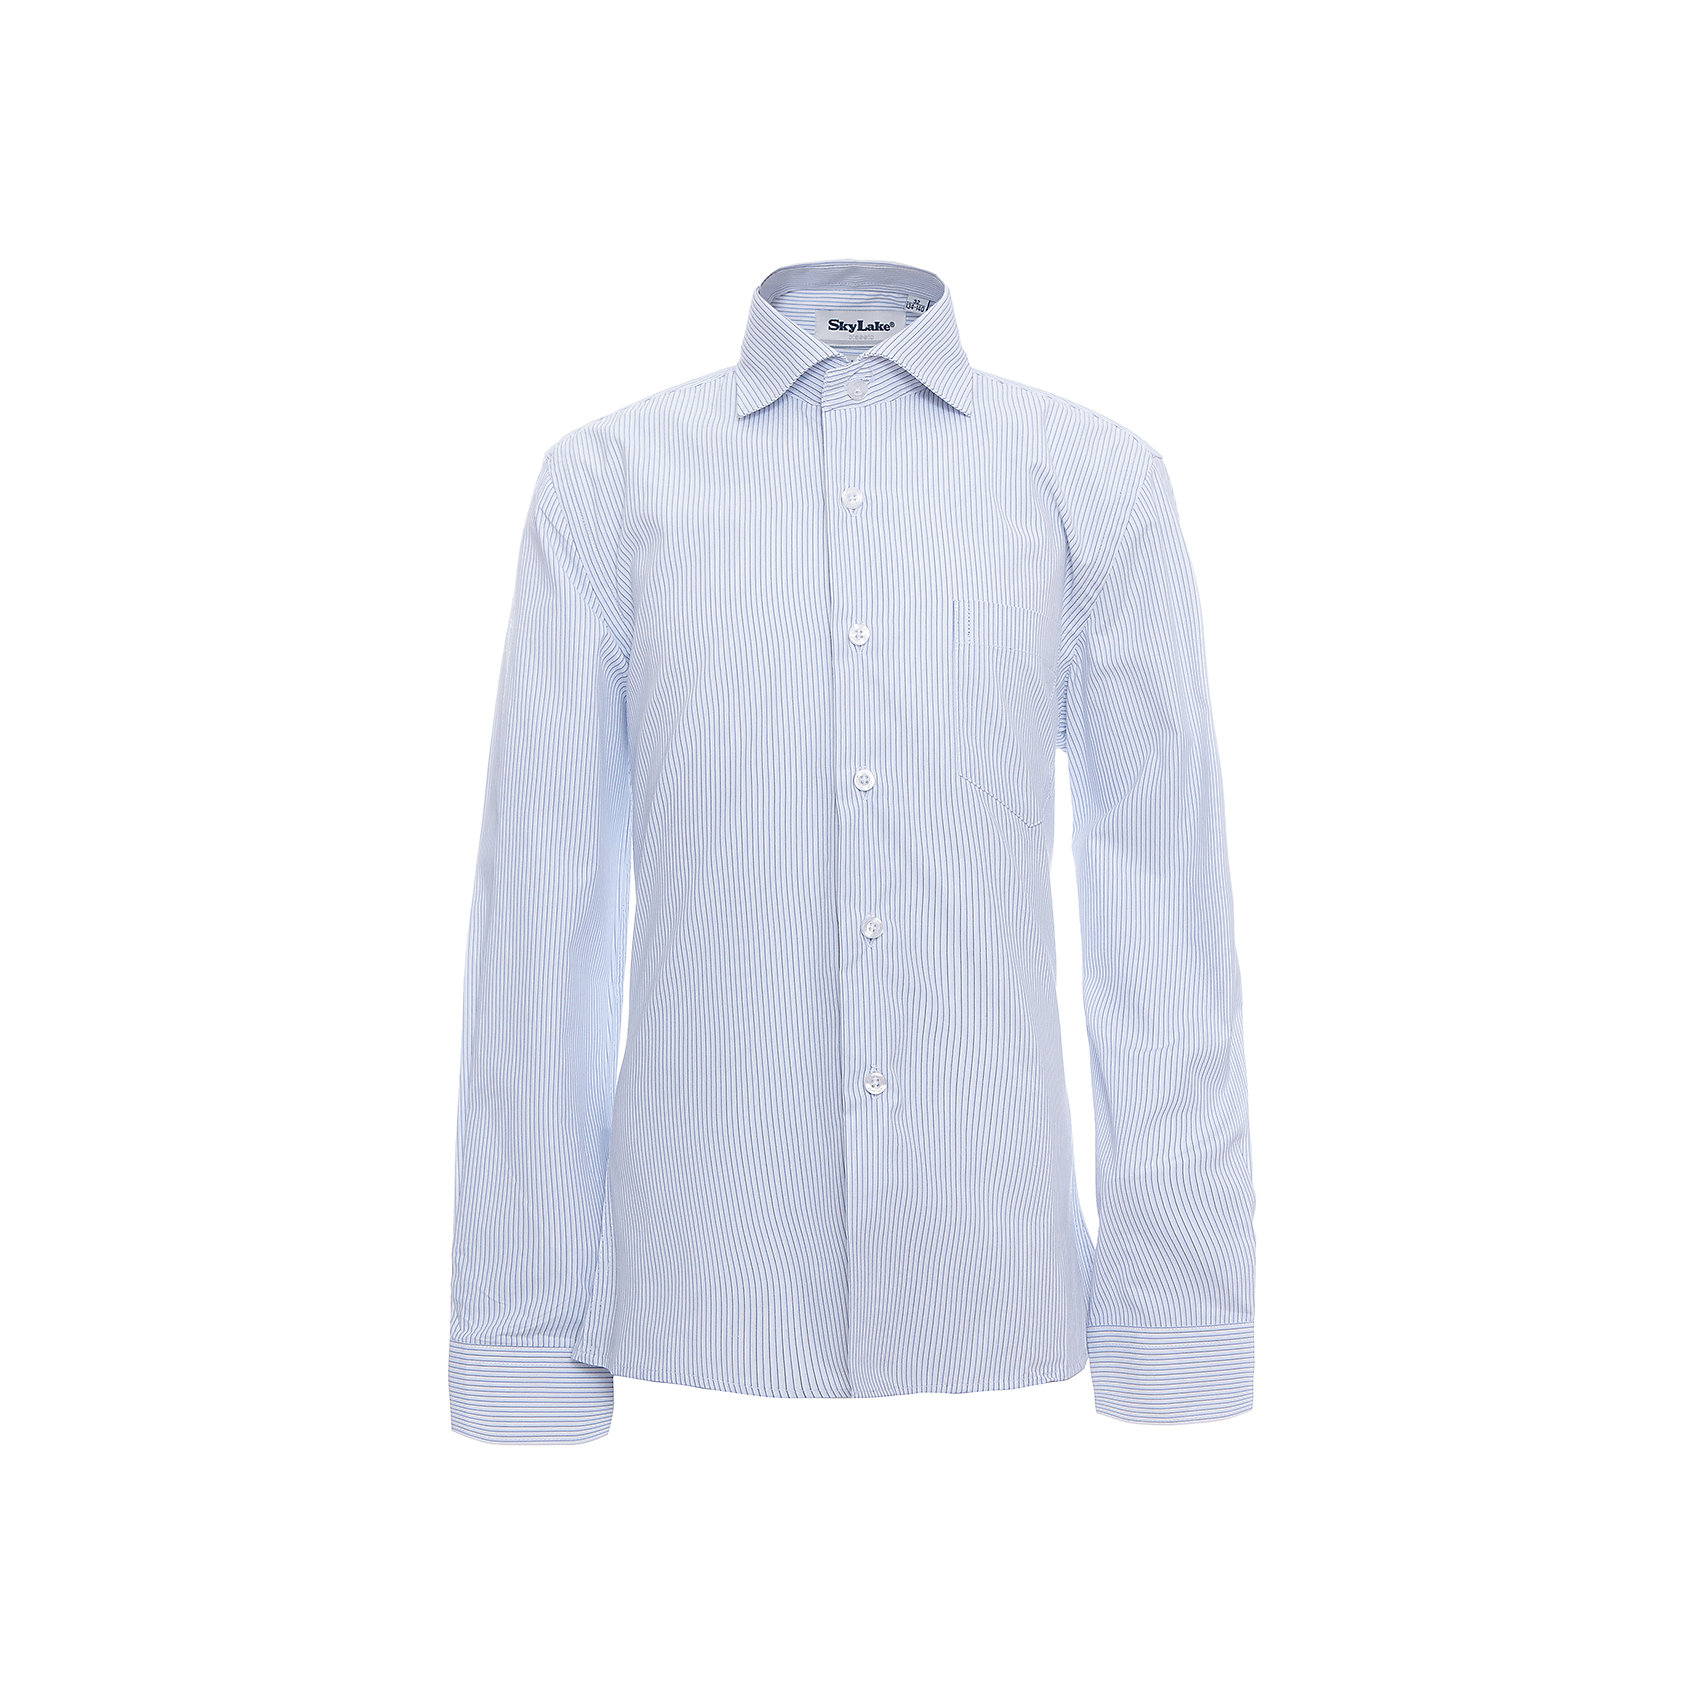 Рубашка CLASSIC SLIM FIT для мальчика SkylakeБлузки и рубашки<br>Сорочка детская для мальчика<br>Состав:<br>80% хлопок, 20% п/э<br><br>Ширина мм: 174<br>Глубина мм: 10<br>Высота мм: 169<br>Вес г: 157<br>Цвет: синий<br>Возраст от месяцев: 144<br>Возраст до месяцев: 156<br>Пол: Мужской<br>Возраст: Детский<br>Размер: 158,122,128,134,140,146,152<br>SKU: 6772761